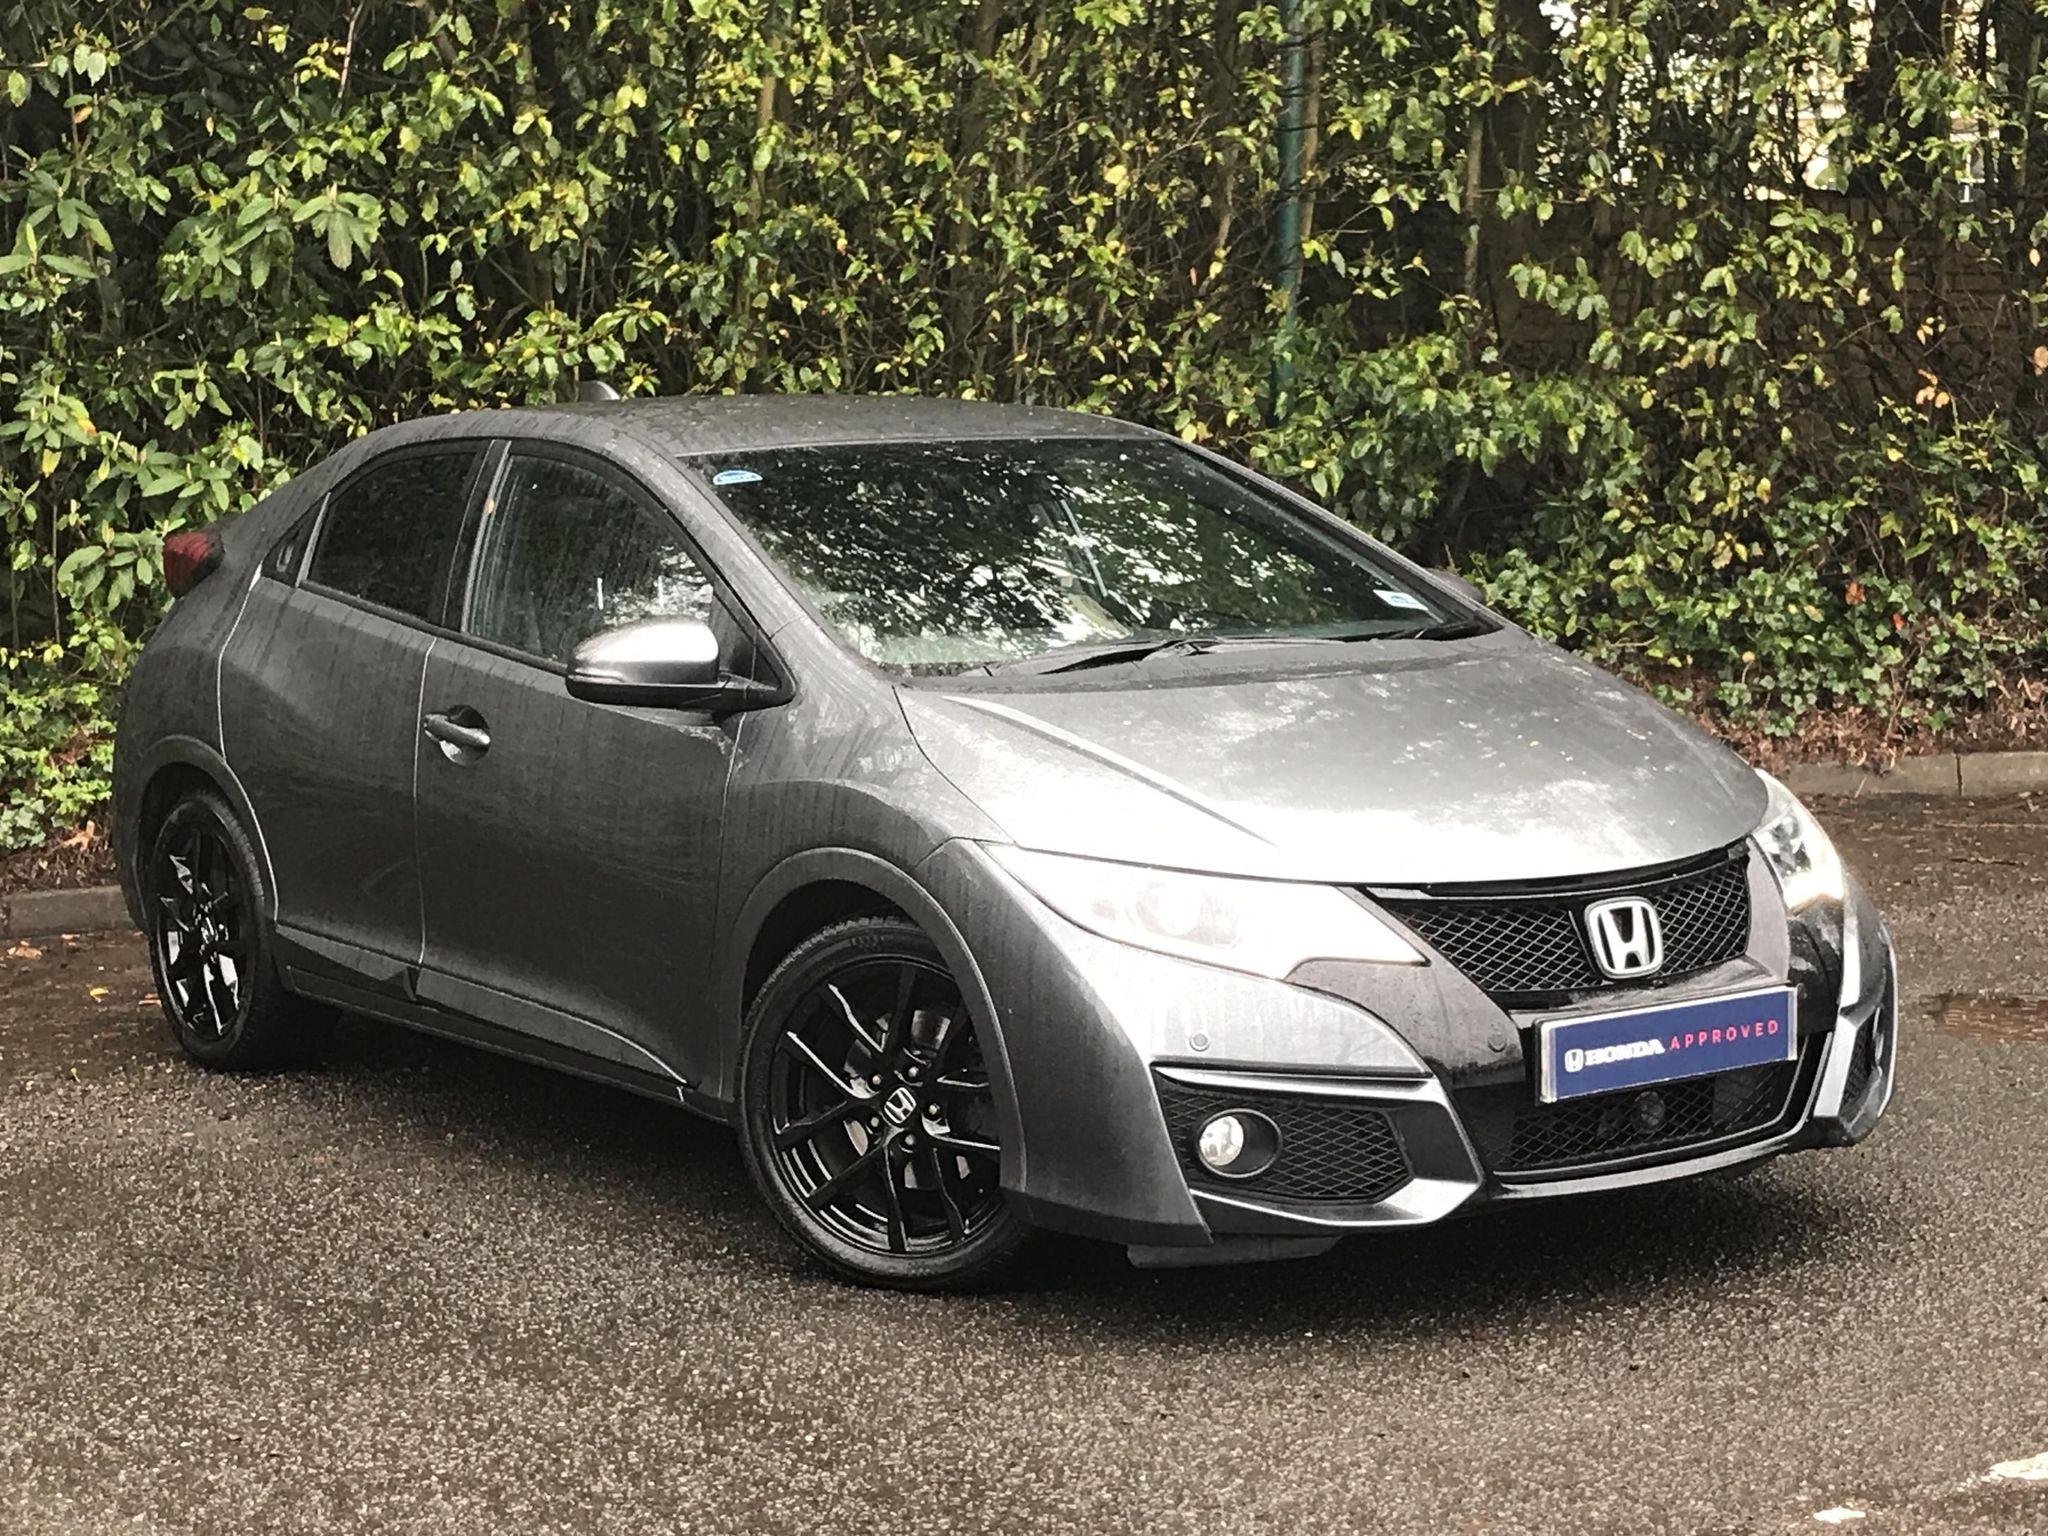 Honda Civic 1.4 i-VTEC Sport (s/s) 5dr